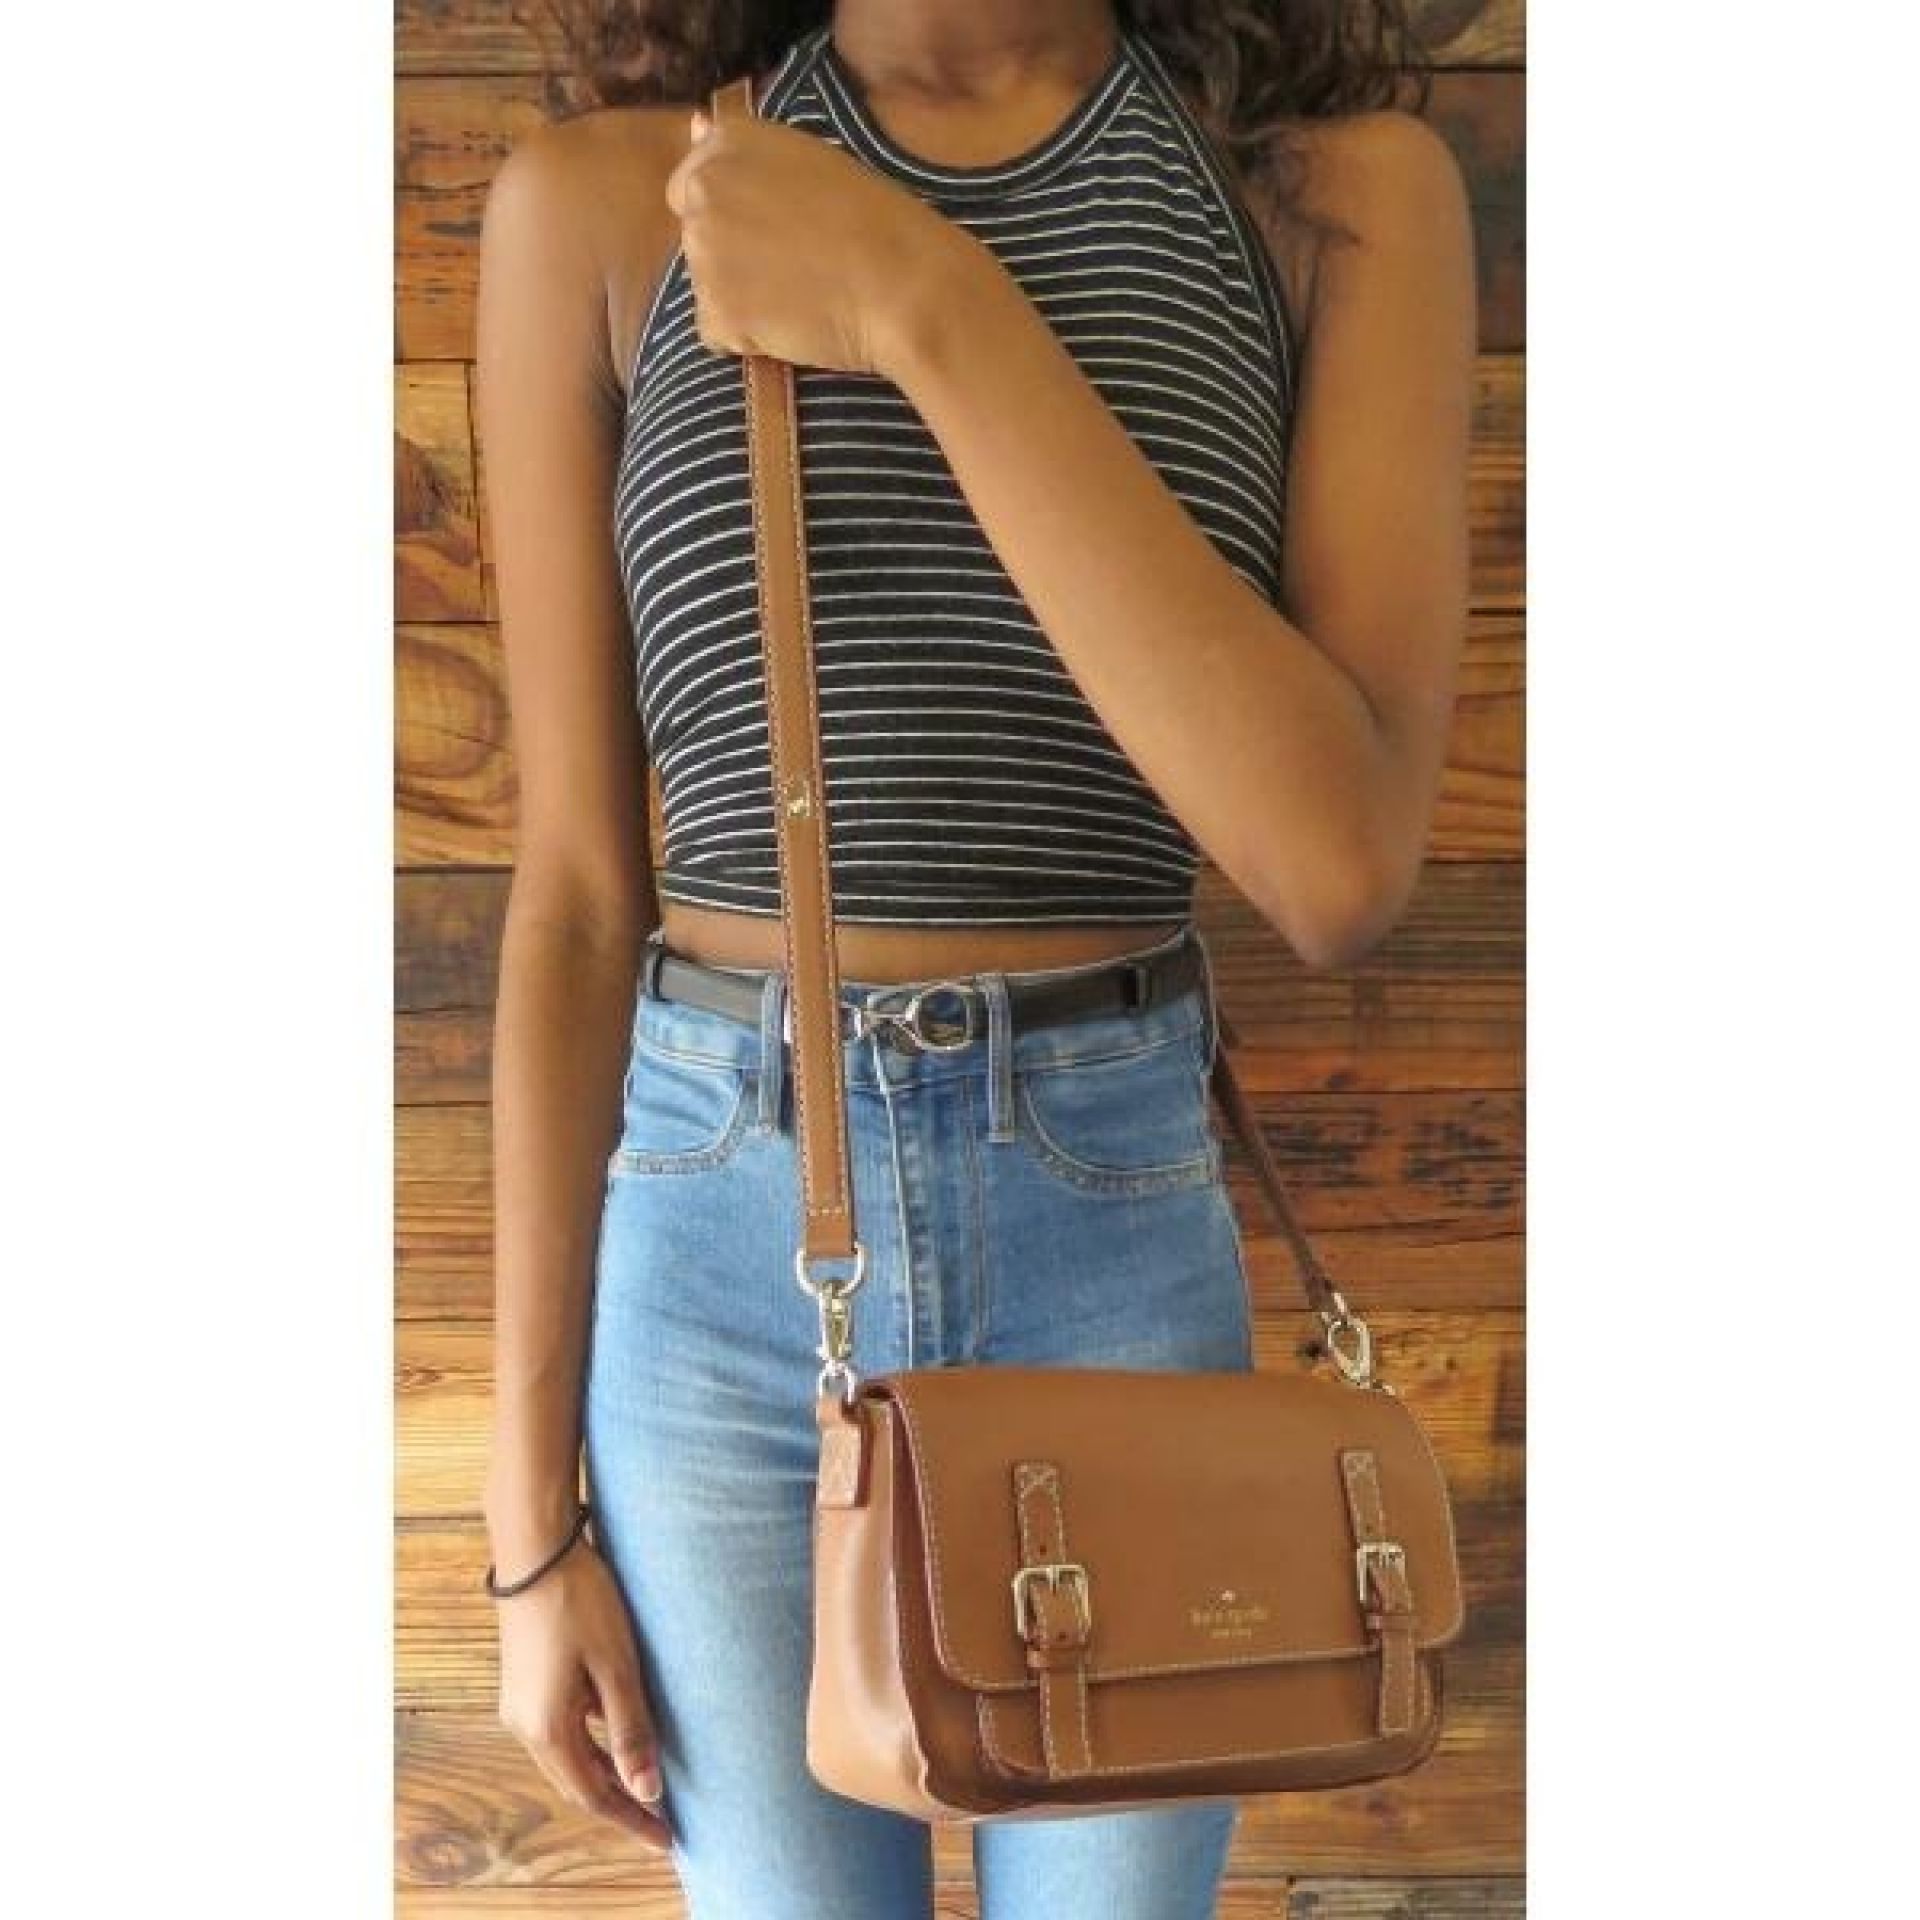 Kate Spade Tan Leather Essex Scout Messenger Crossbody Bag